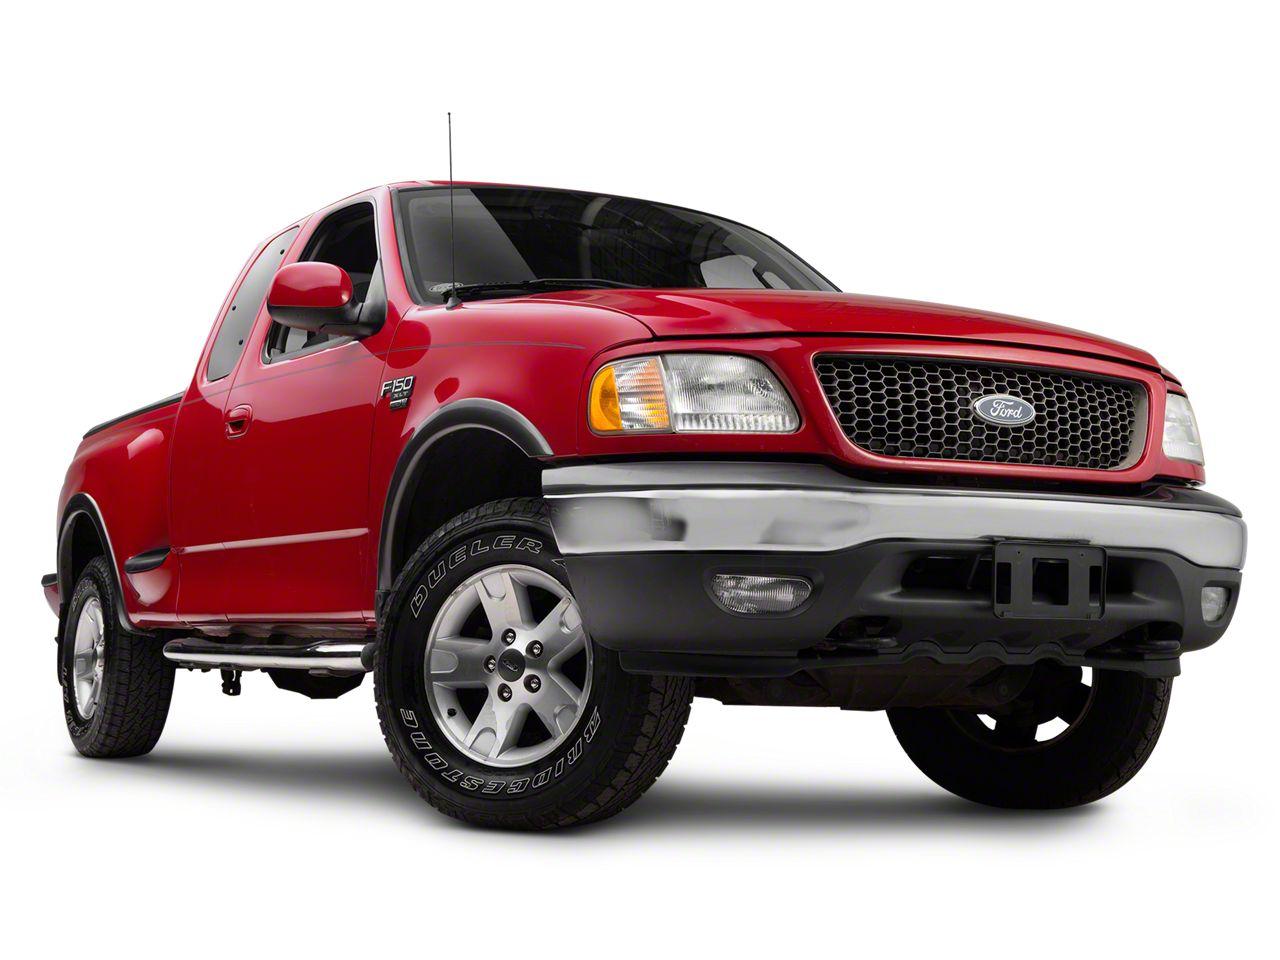 Accesorios Para Trocas Ford F150 >> Ford F 150 Accessories Parts Americantrucks